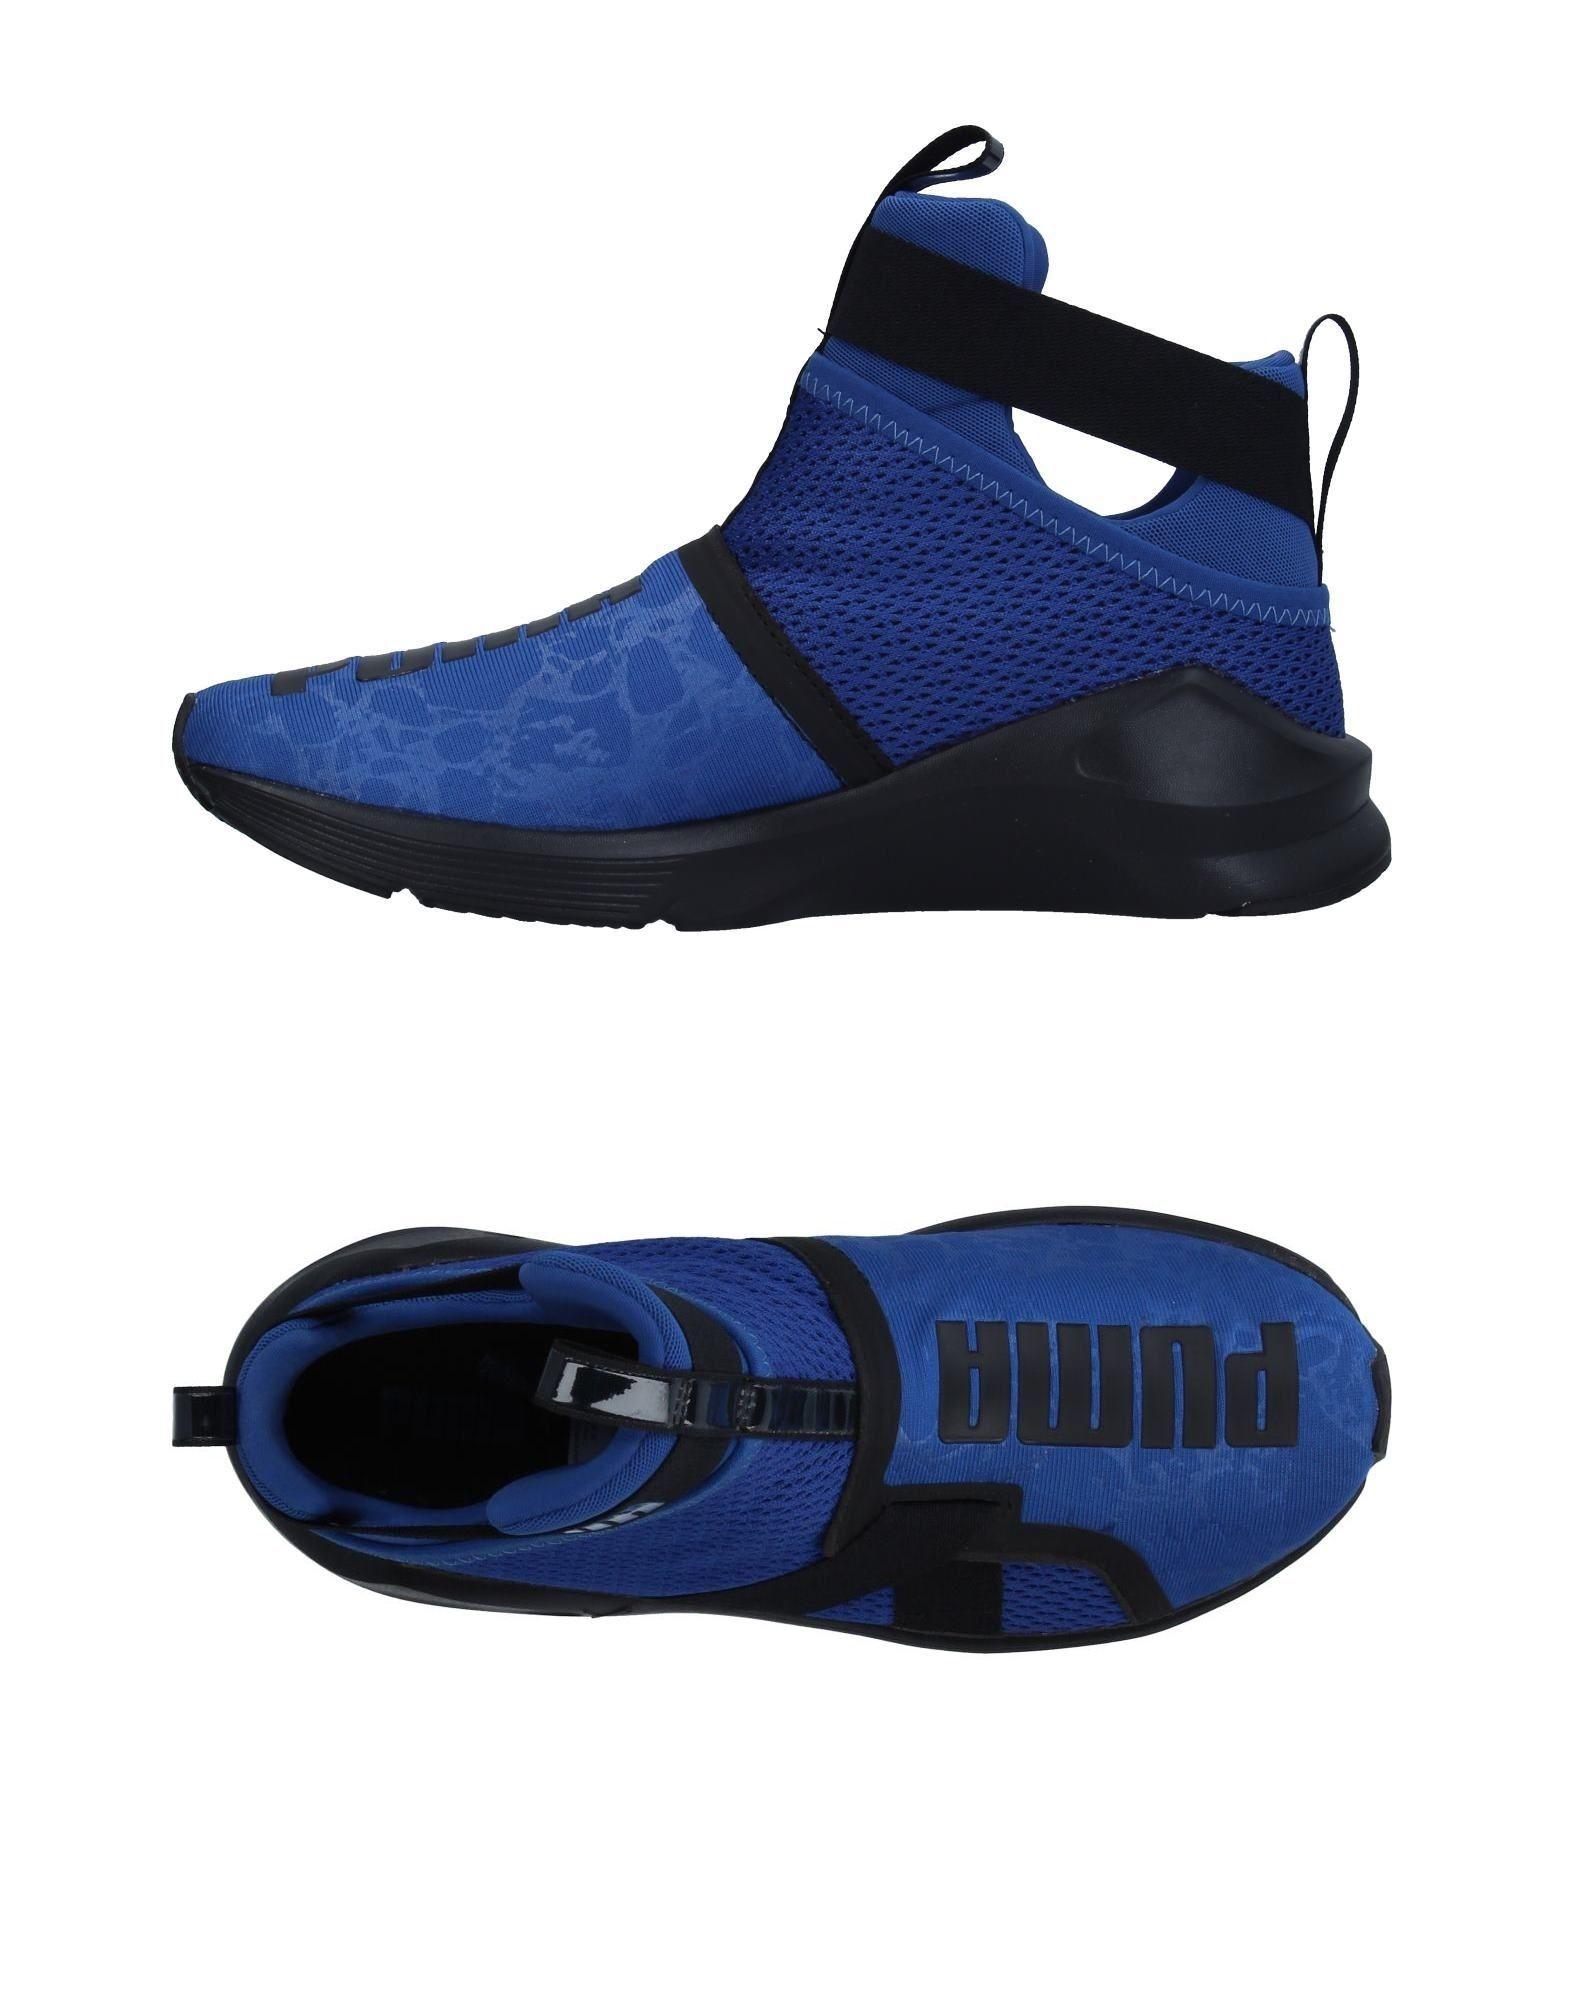 PUMA Высокие кеды и кроссовки кеды кроссовки высокие dc council mid tx stone camo